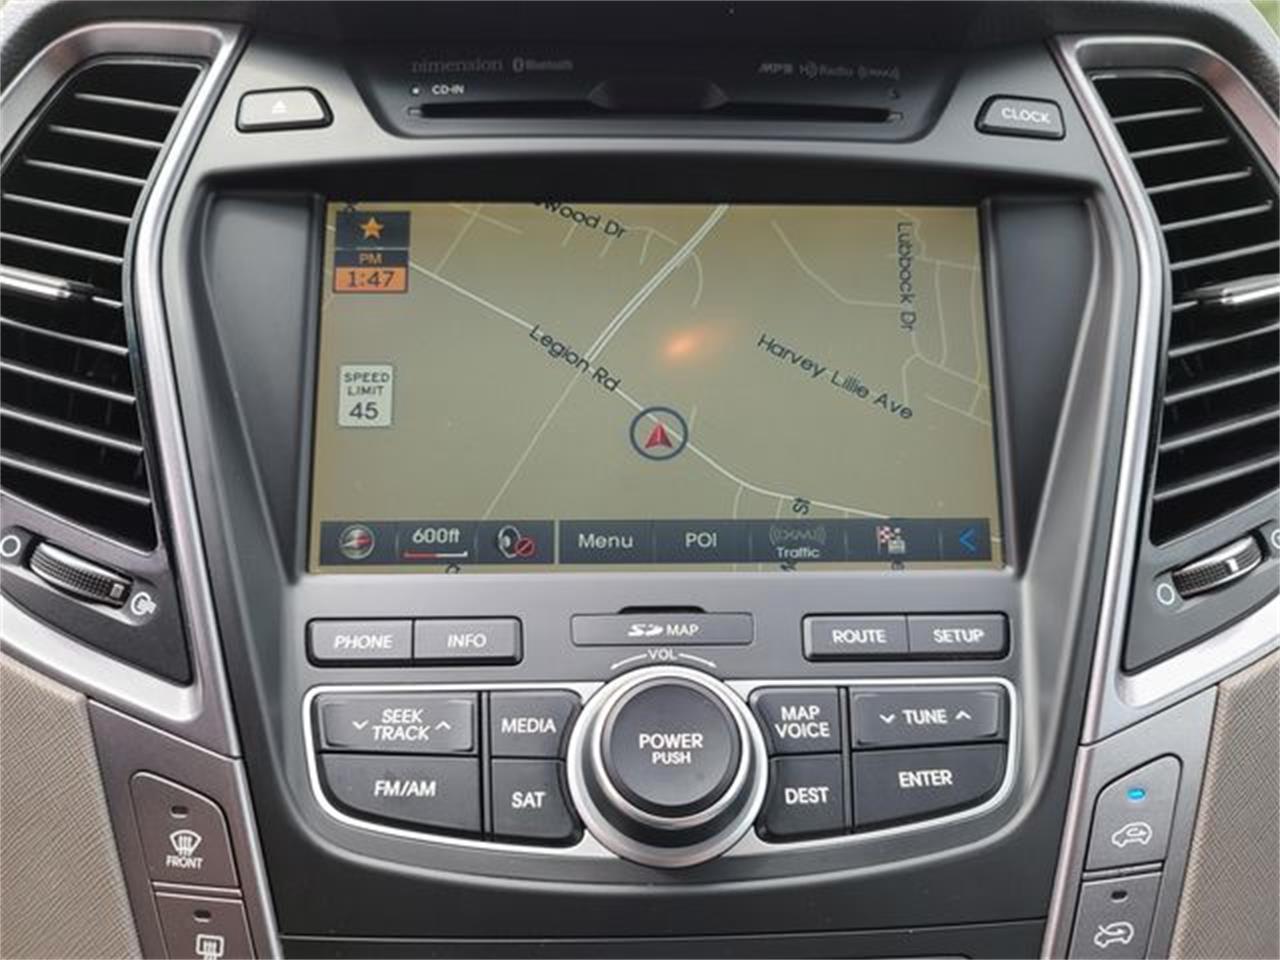 2013 Hyundai Santa Fe (CC-1365060) for sale in Hope Mills, North Carolina